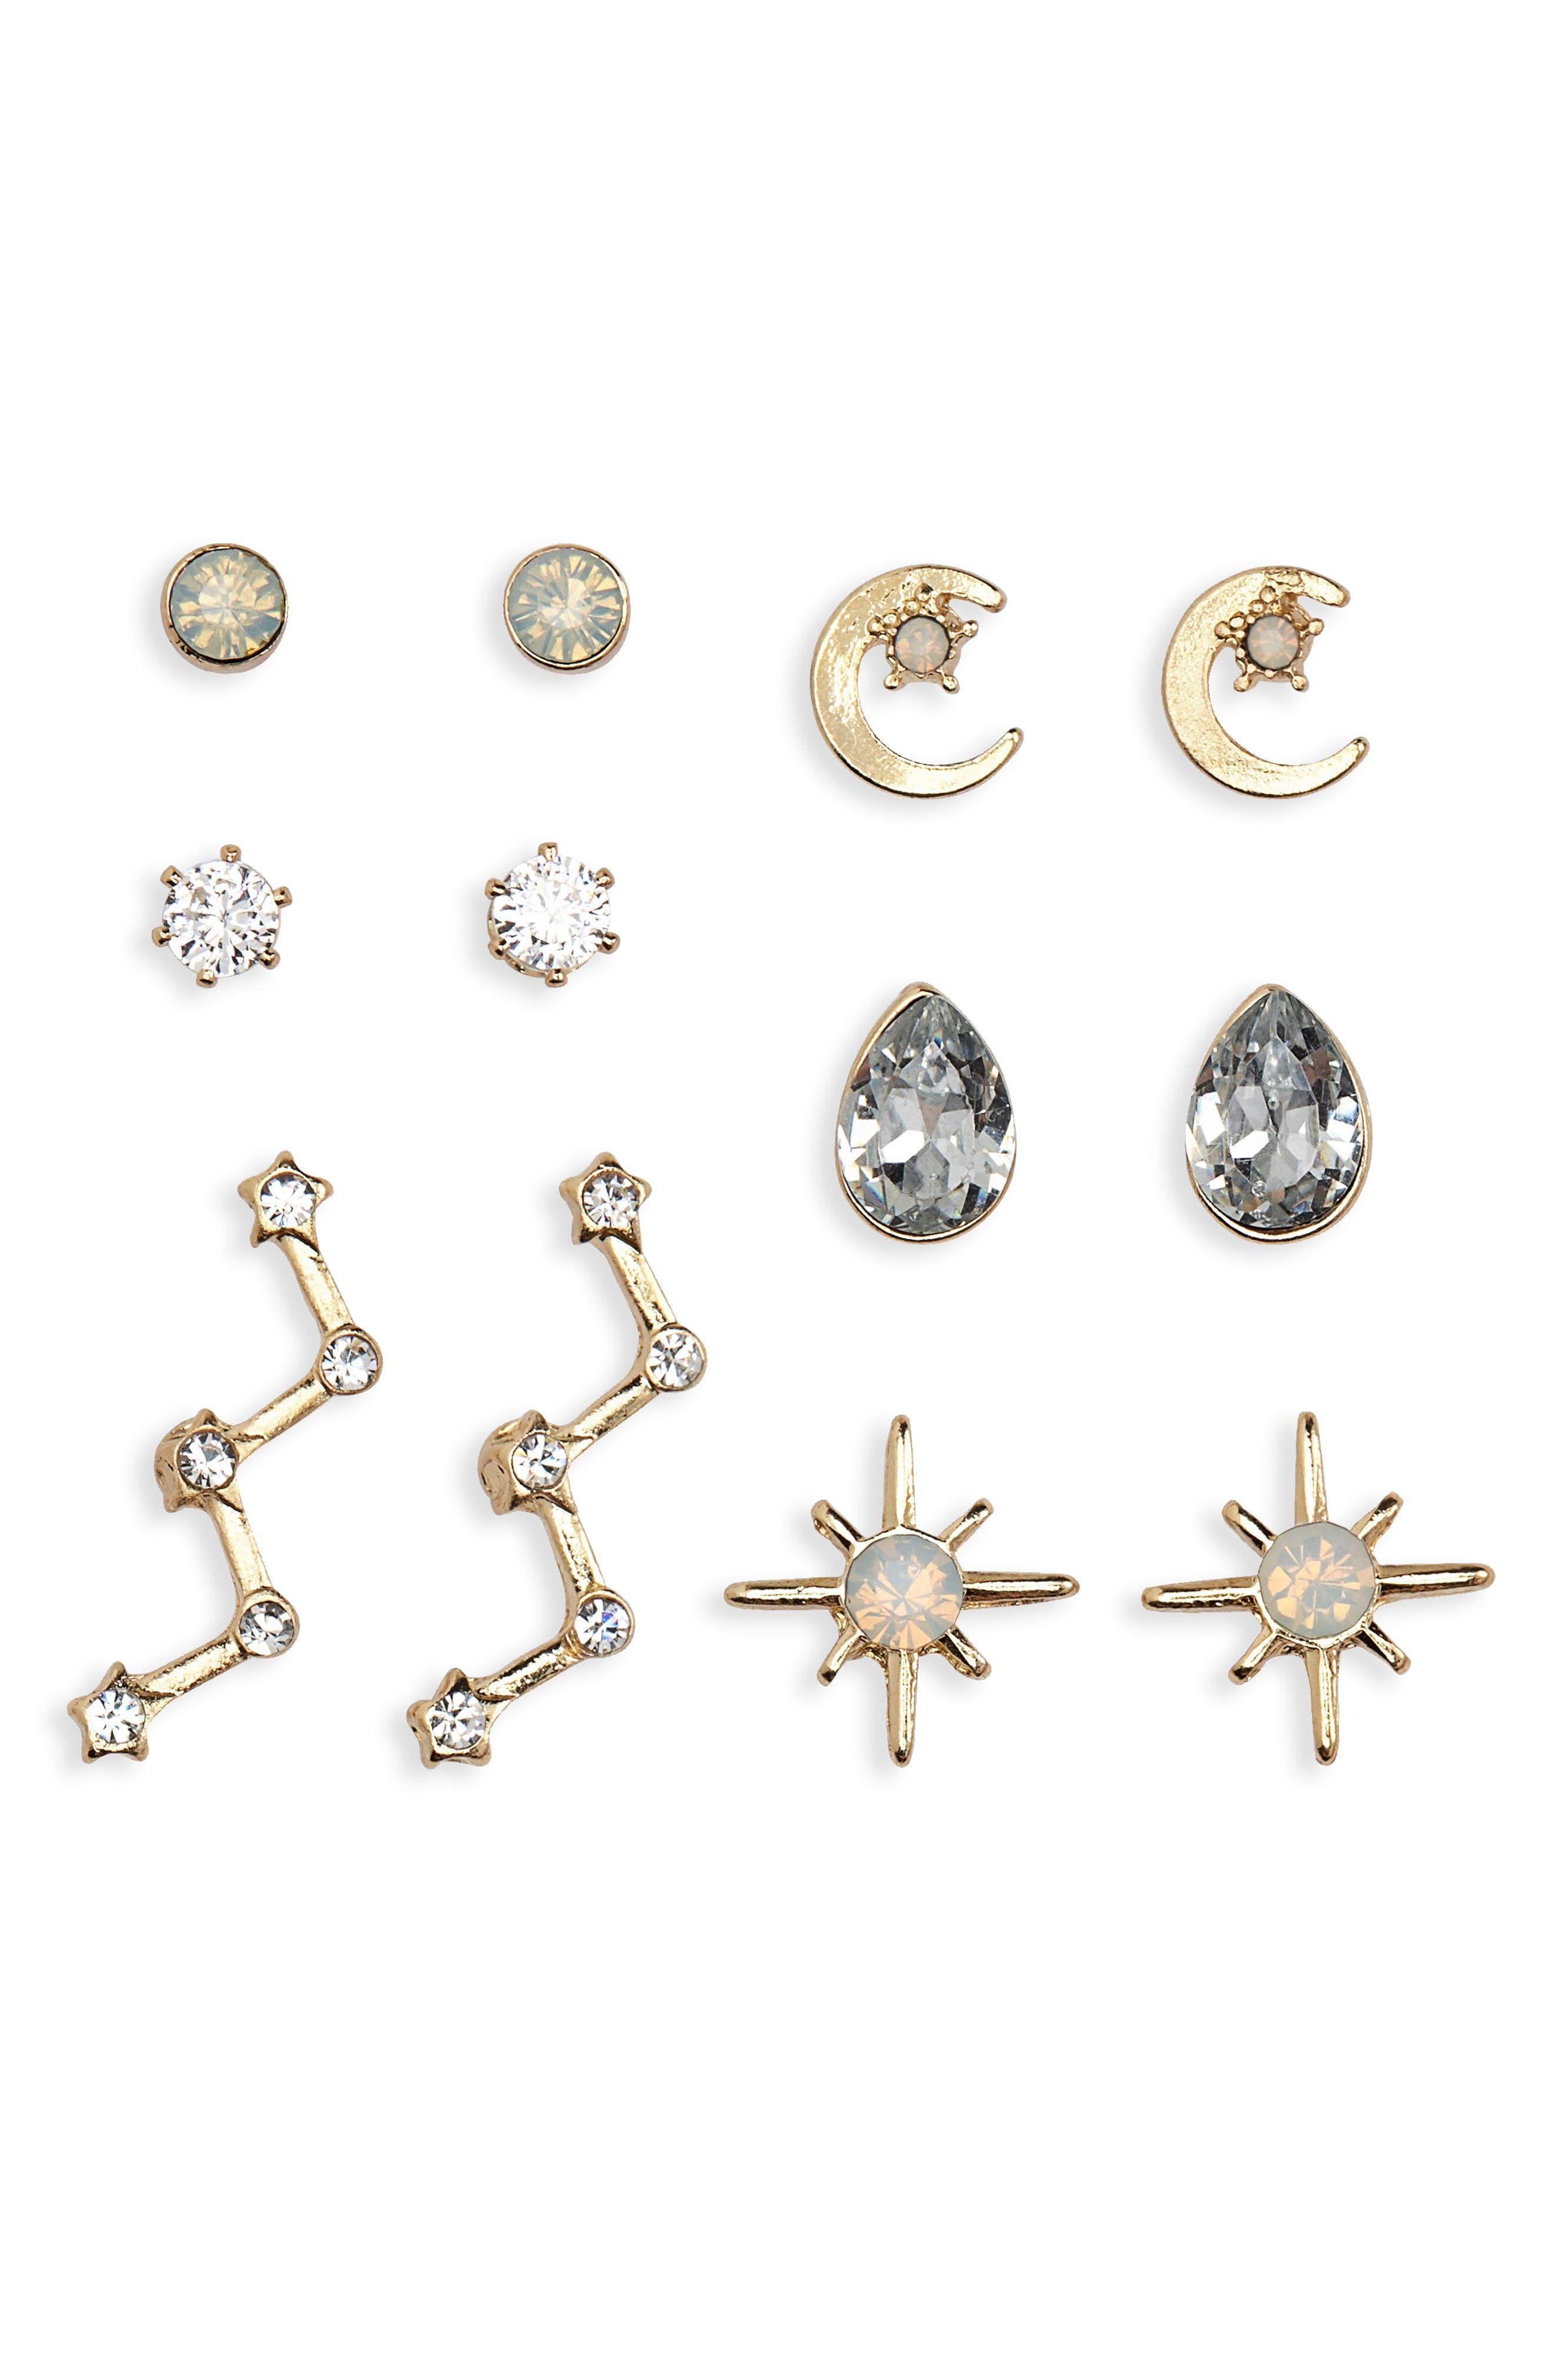 Set of 6 Moon & Star Stud Earrings,                         Main,                         color, 710